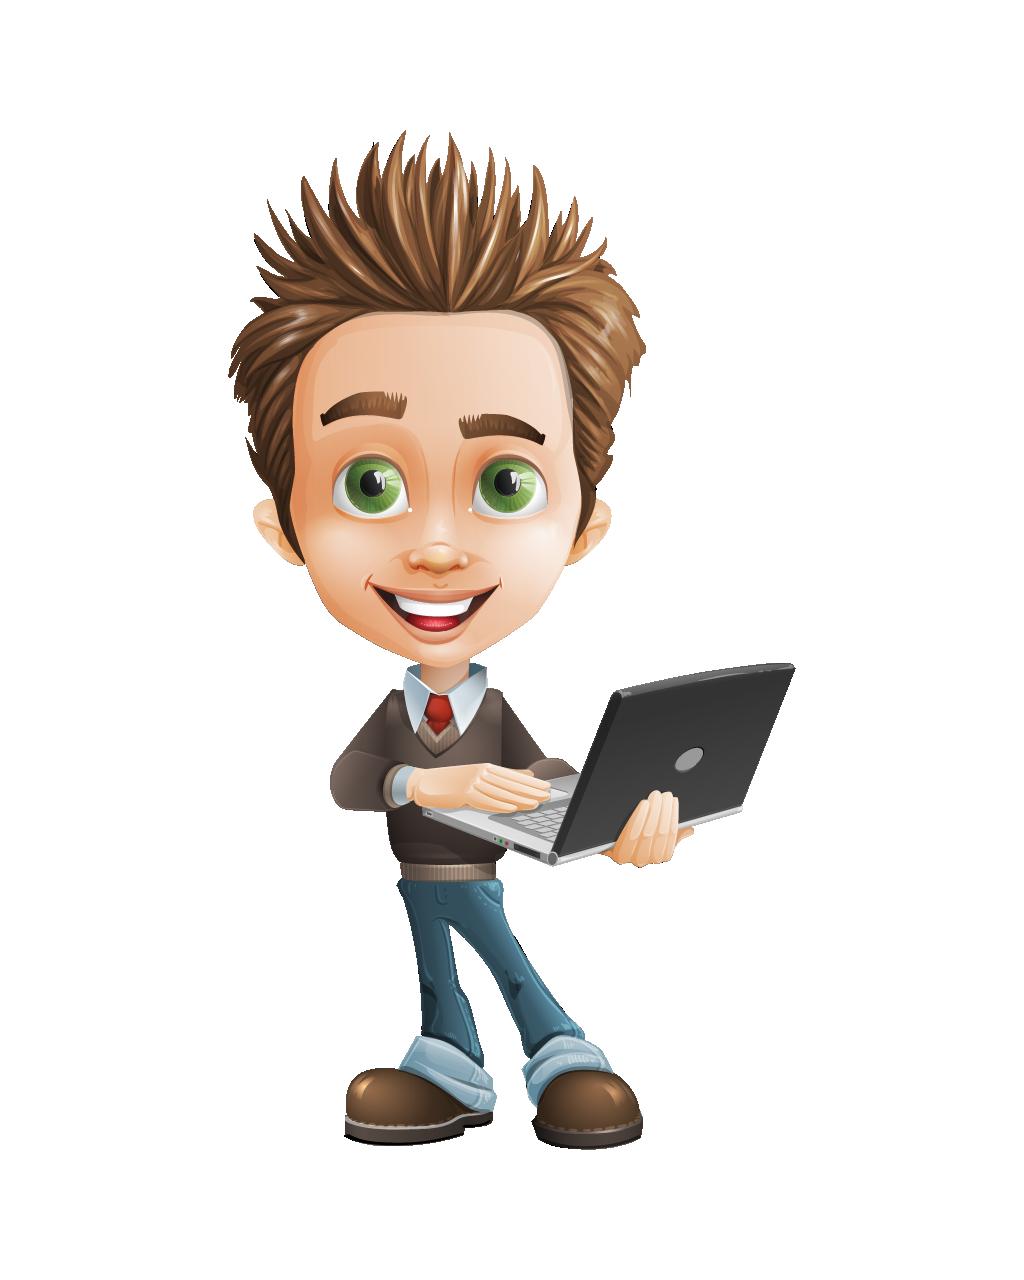 Hackhand-Dating-Website